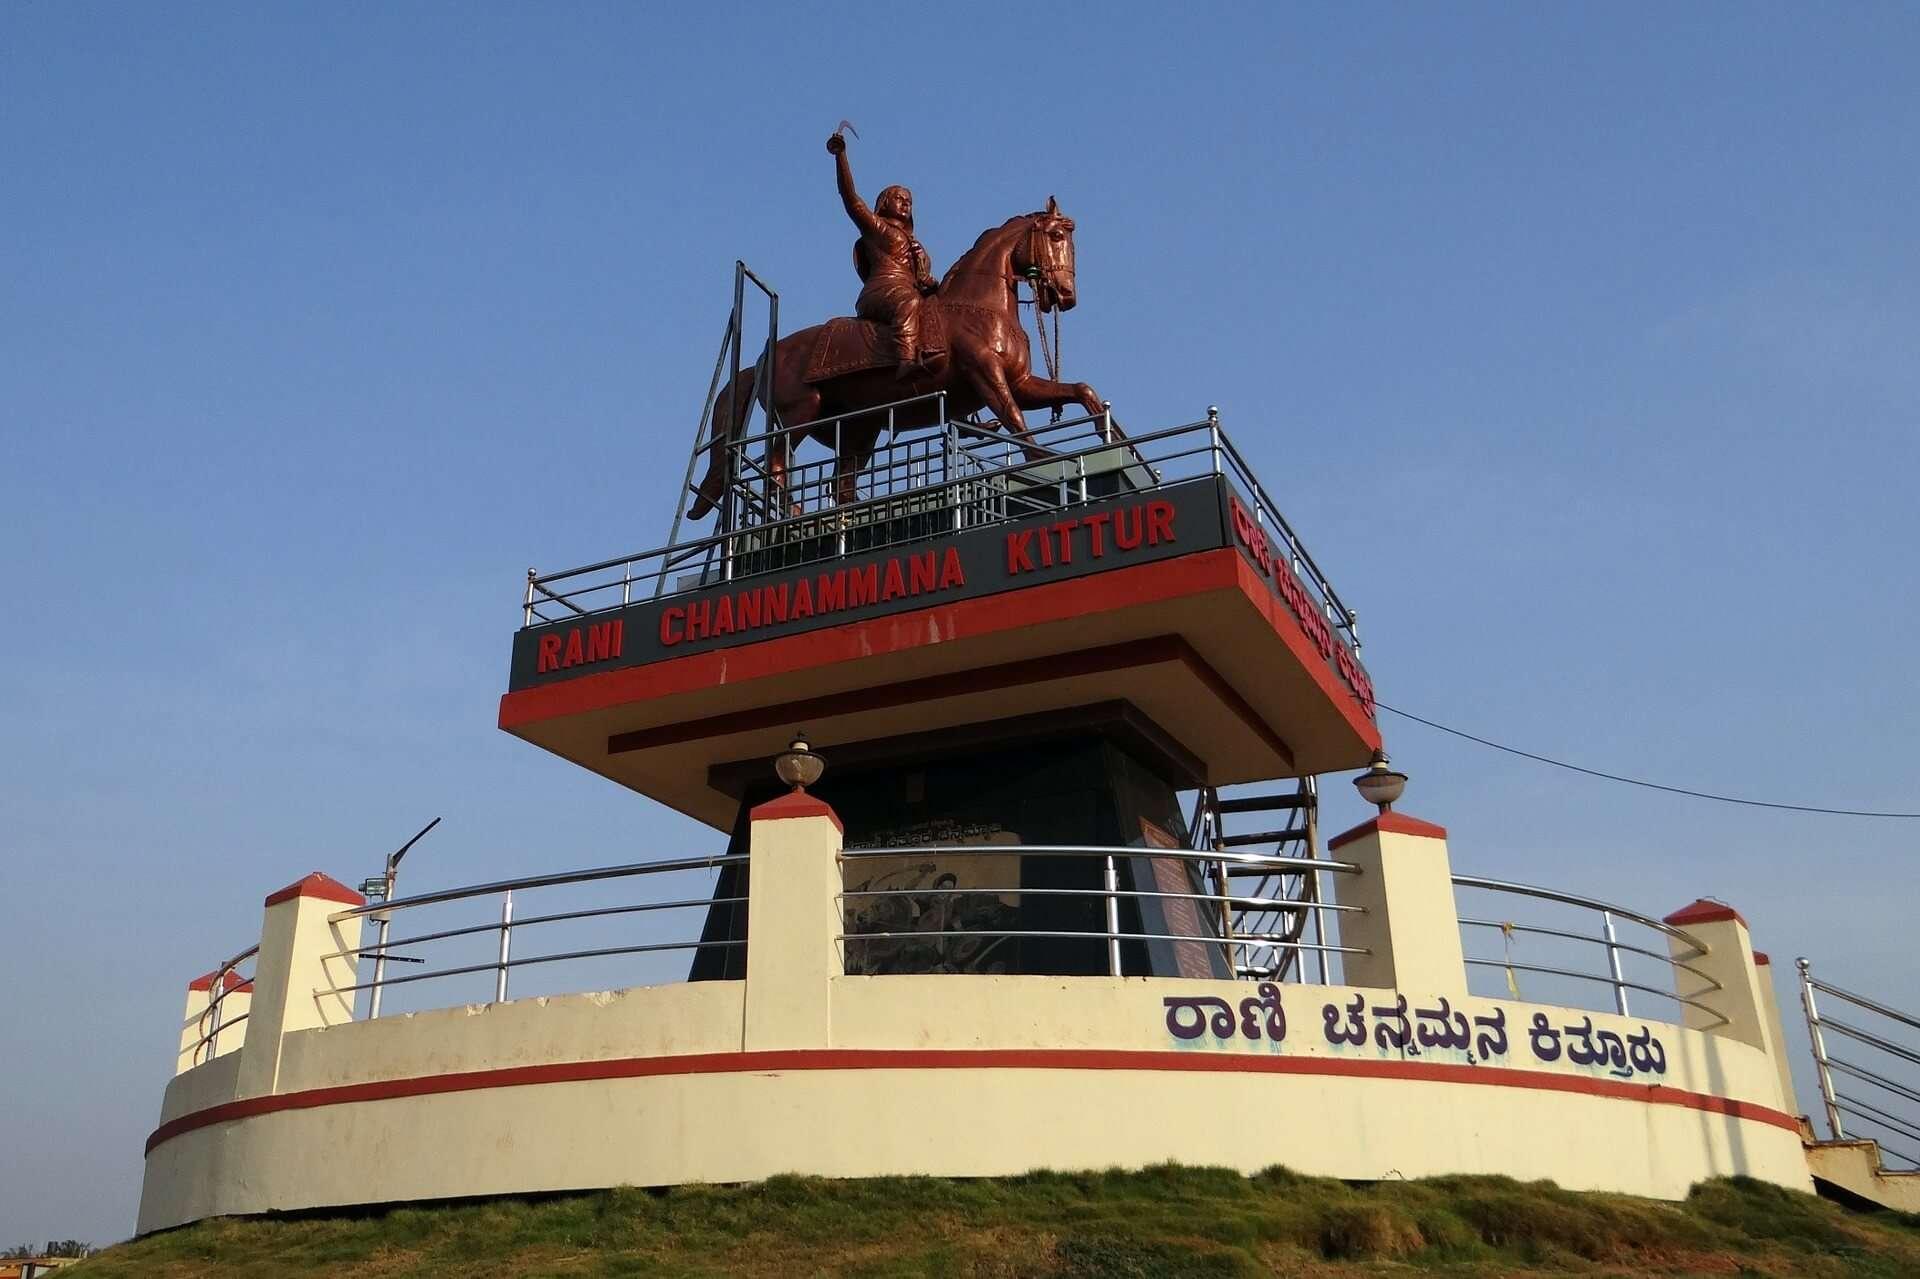 A statue of Rani Channammana Kittur in Belgaum, Karnataka